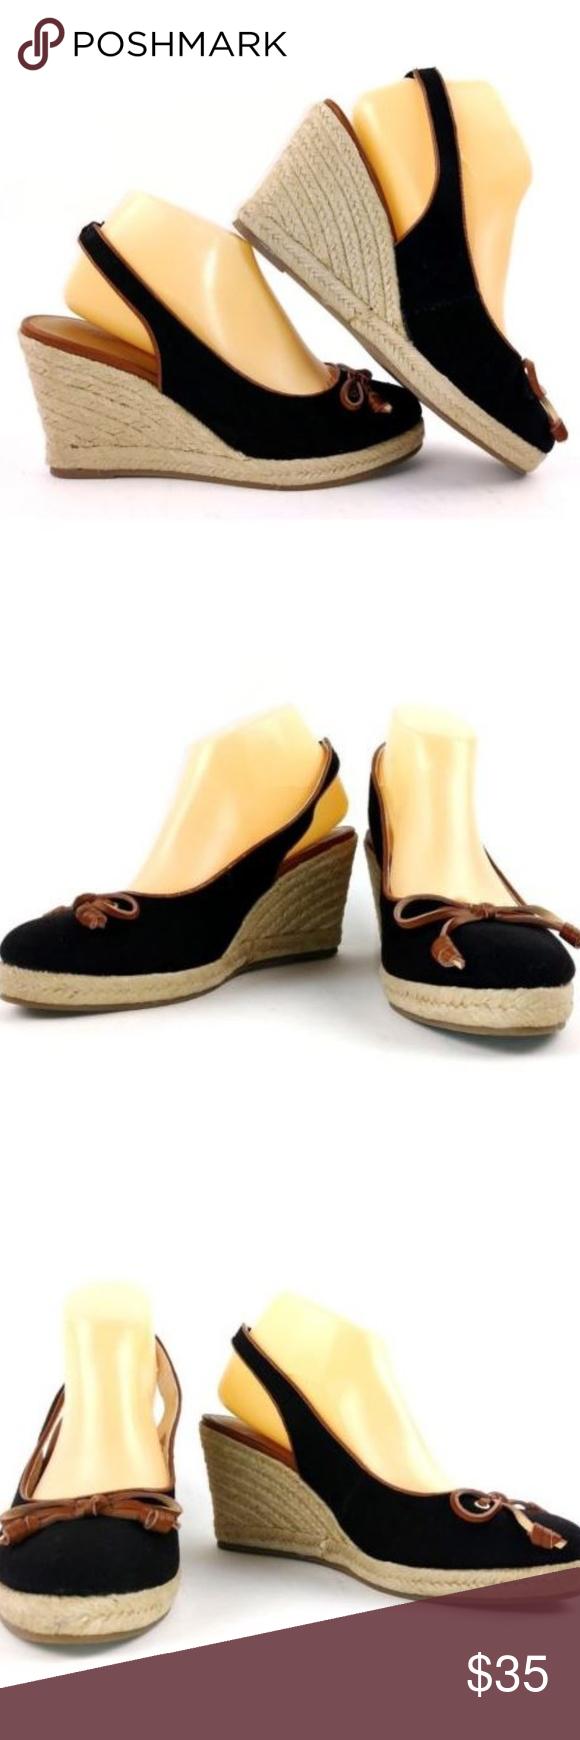 48c9836cb1c Bass Kim Espadrille Wedge Sandals Size 9.5 Black Bass Womens Kim ...